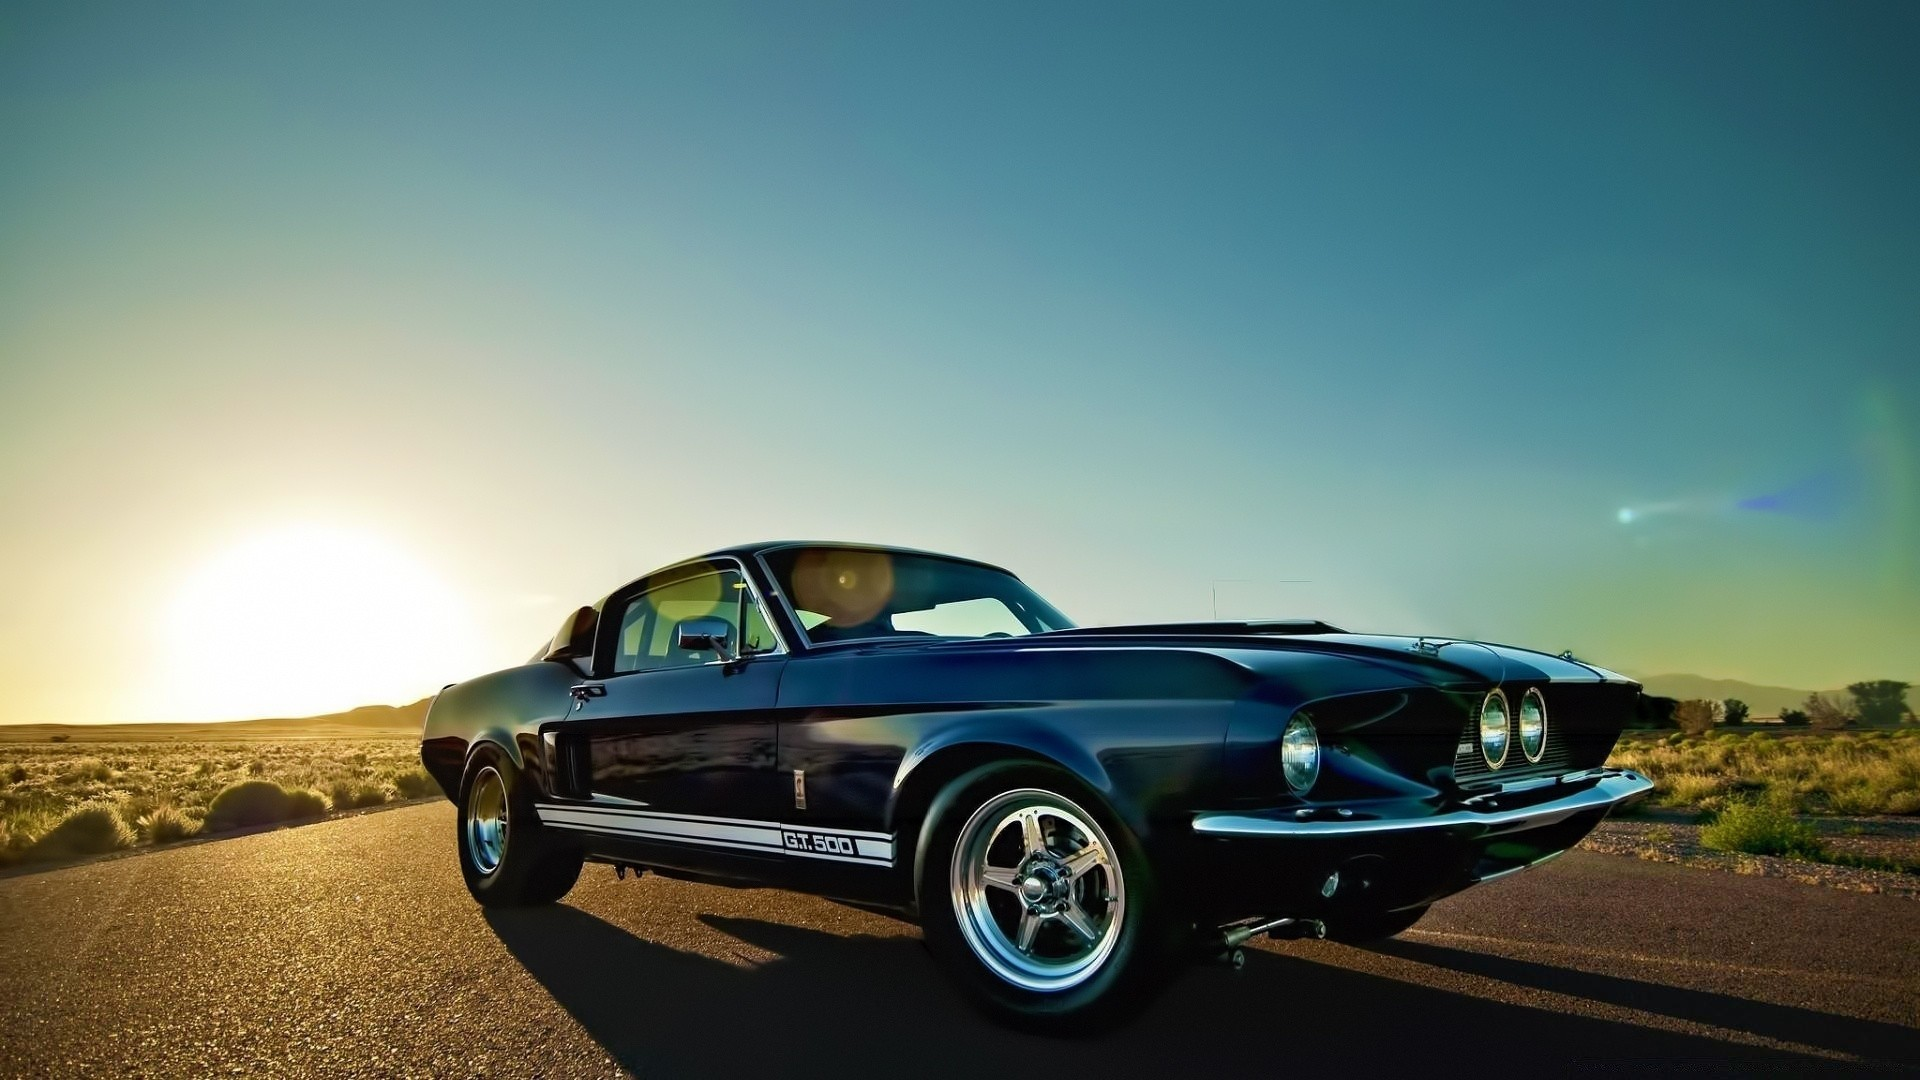 Mustang Wallpaper 1920x1080